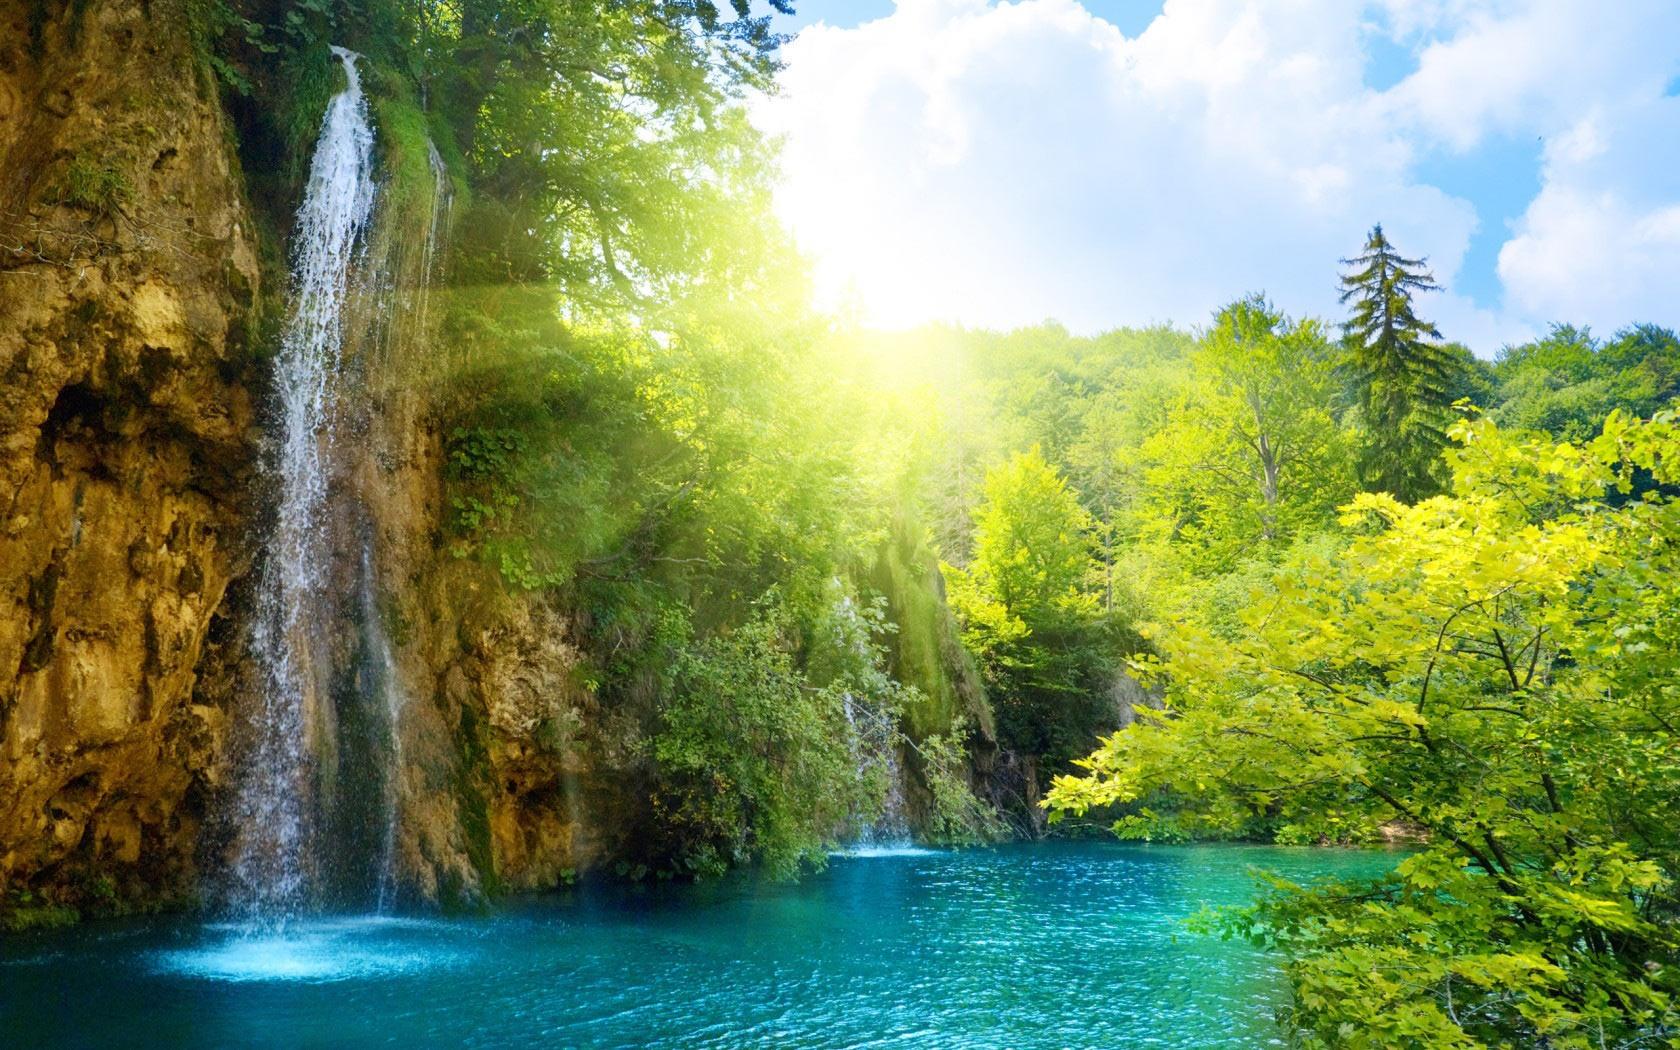 Sunny Waterfall desktop wallpaper 1680x1050